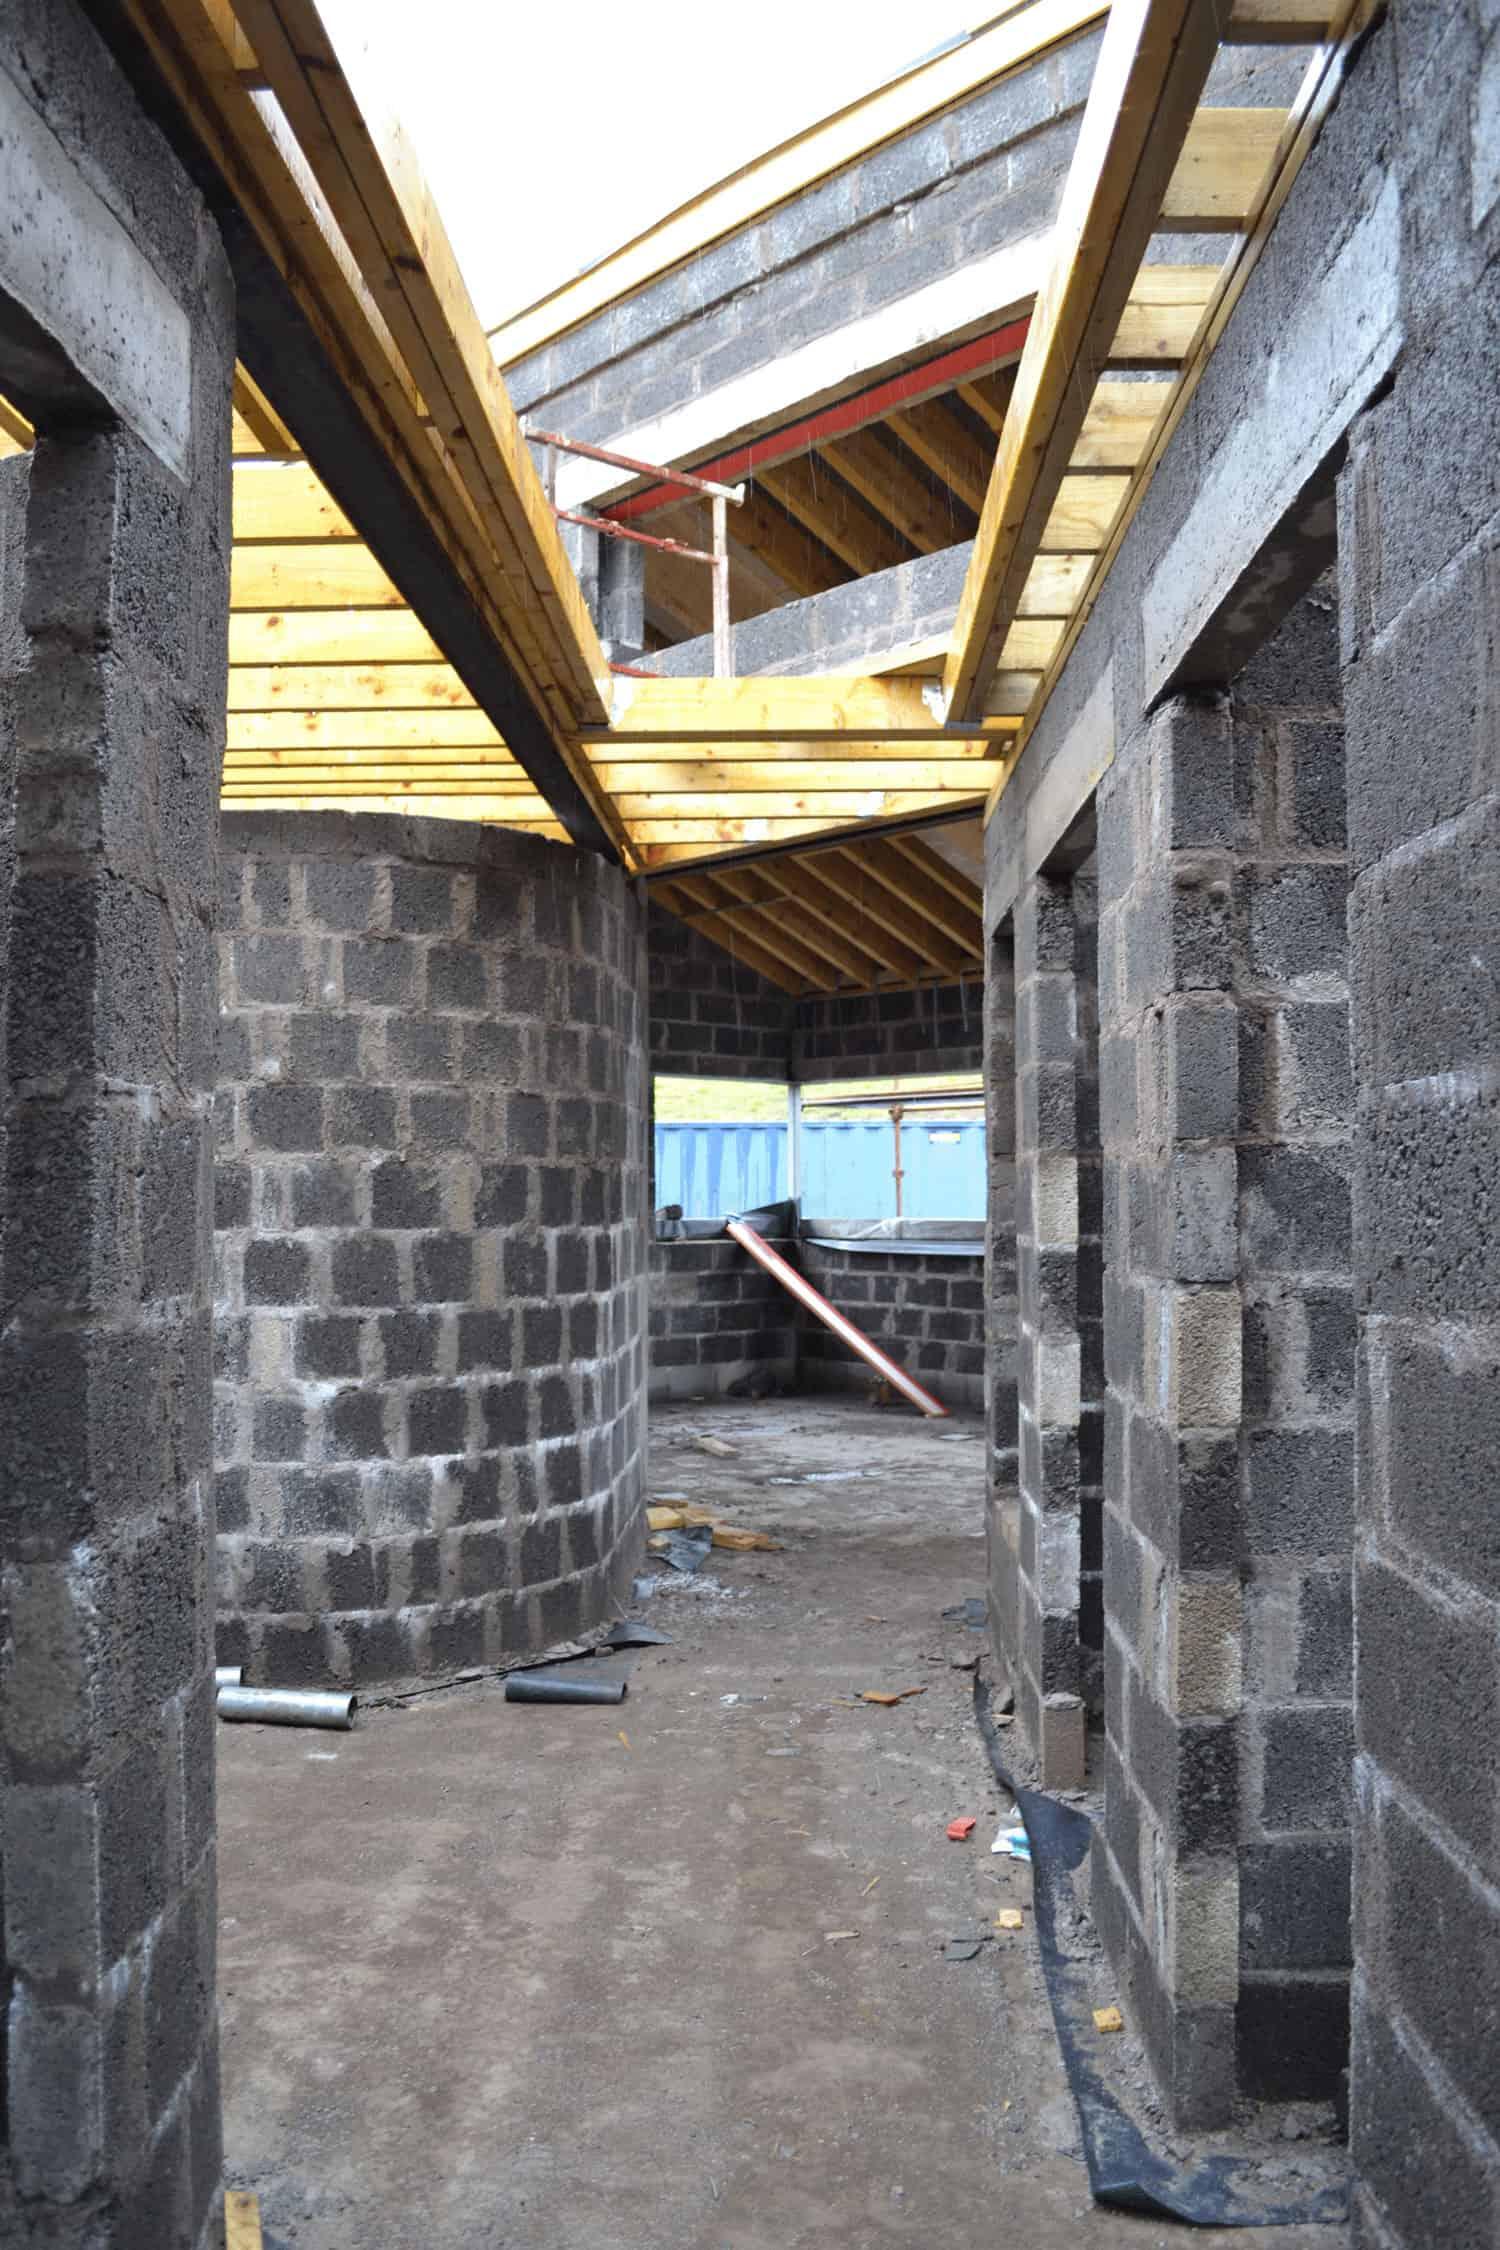 Keown Dwelling - Hallway Under Construction